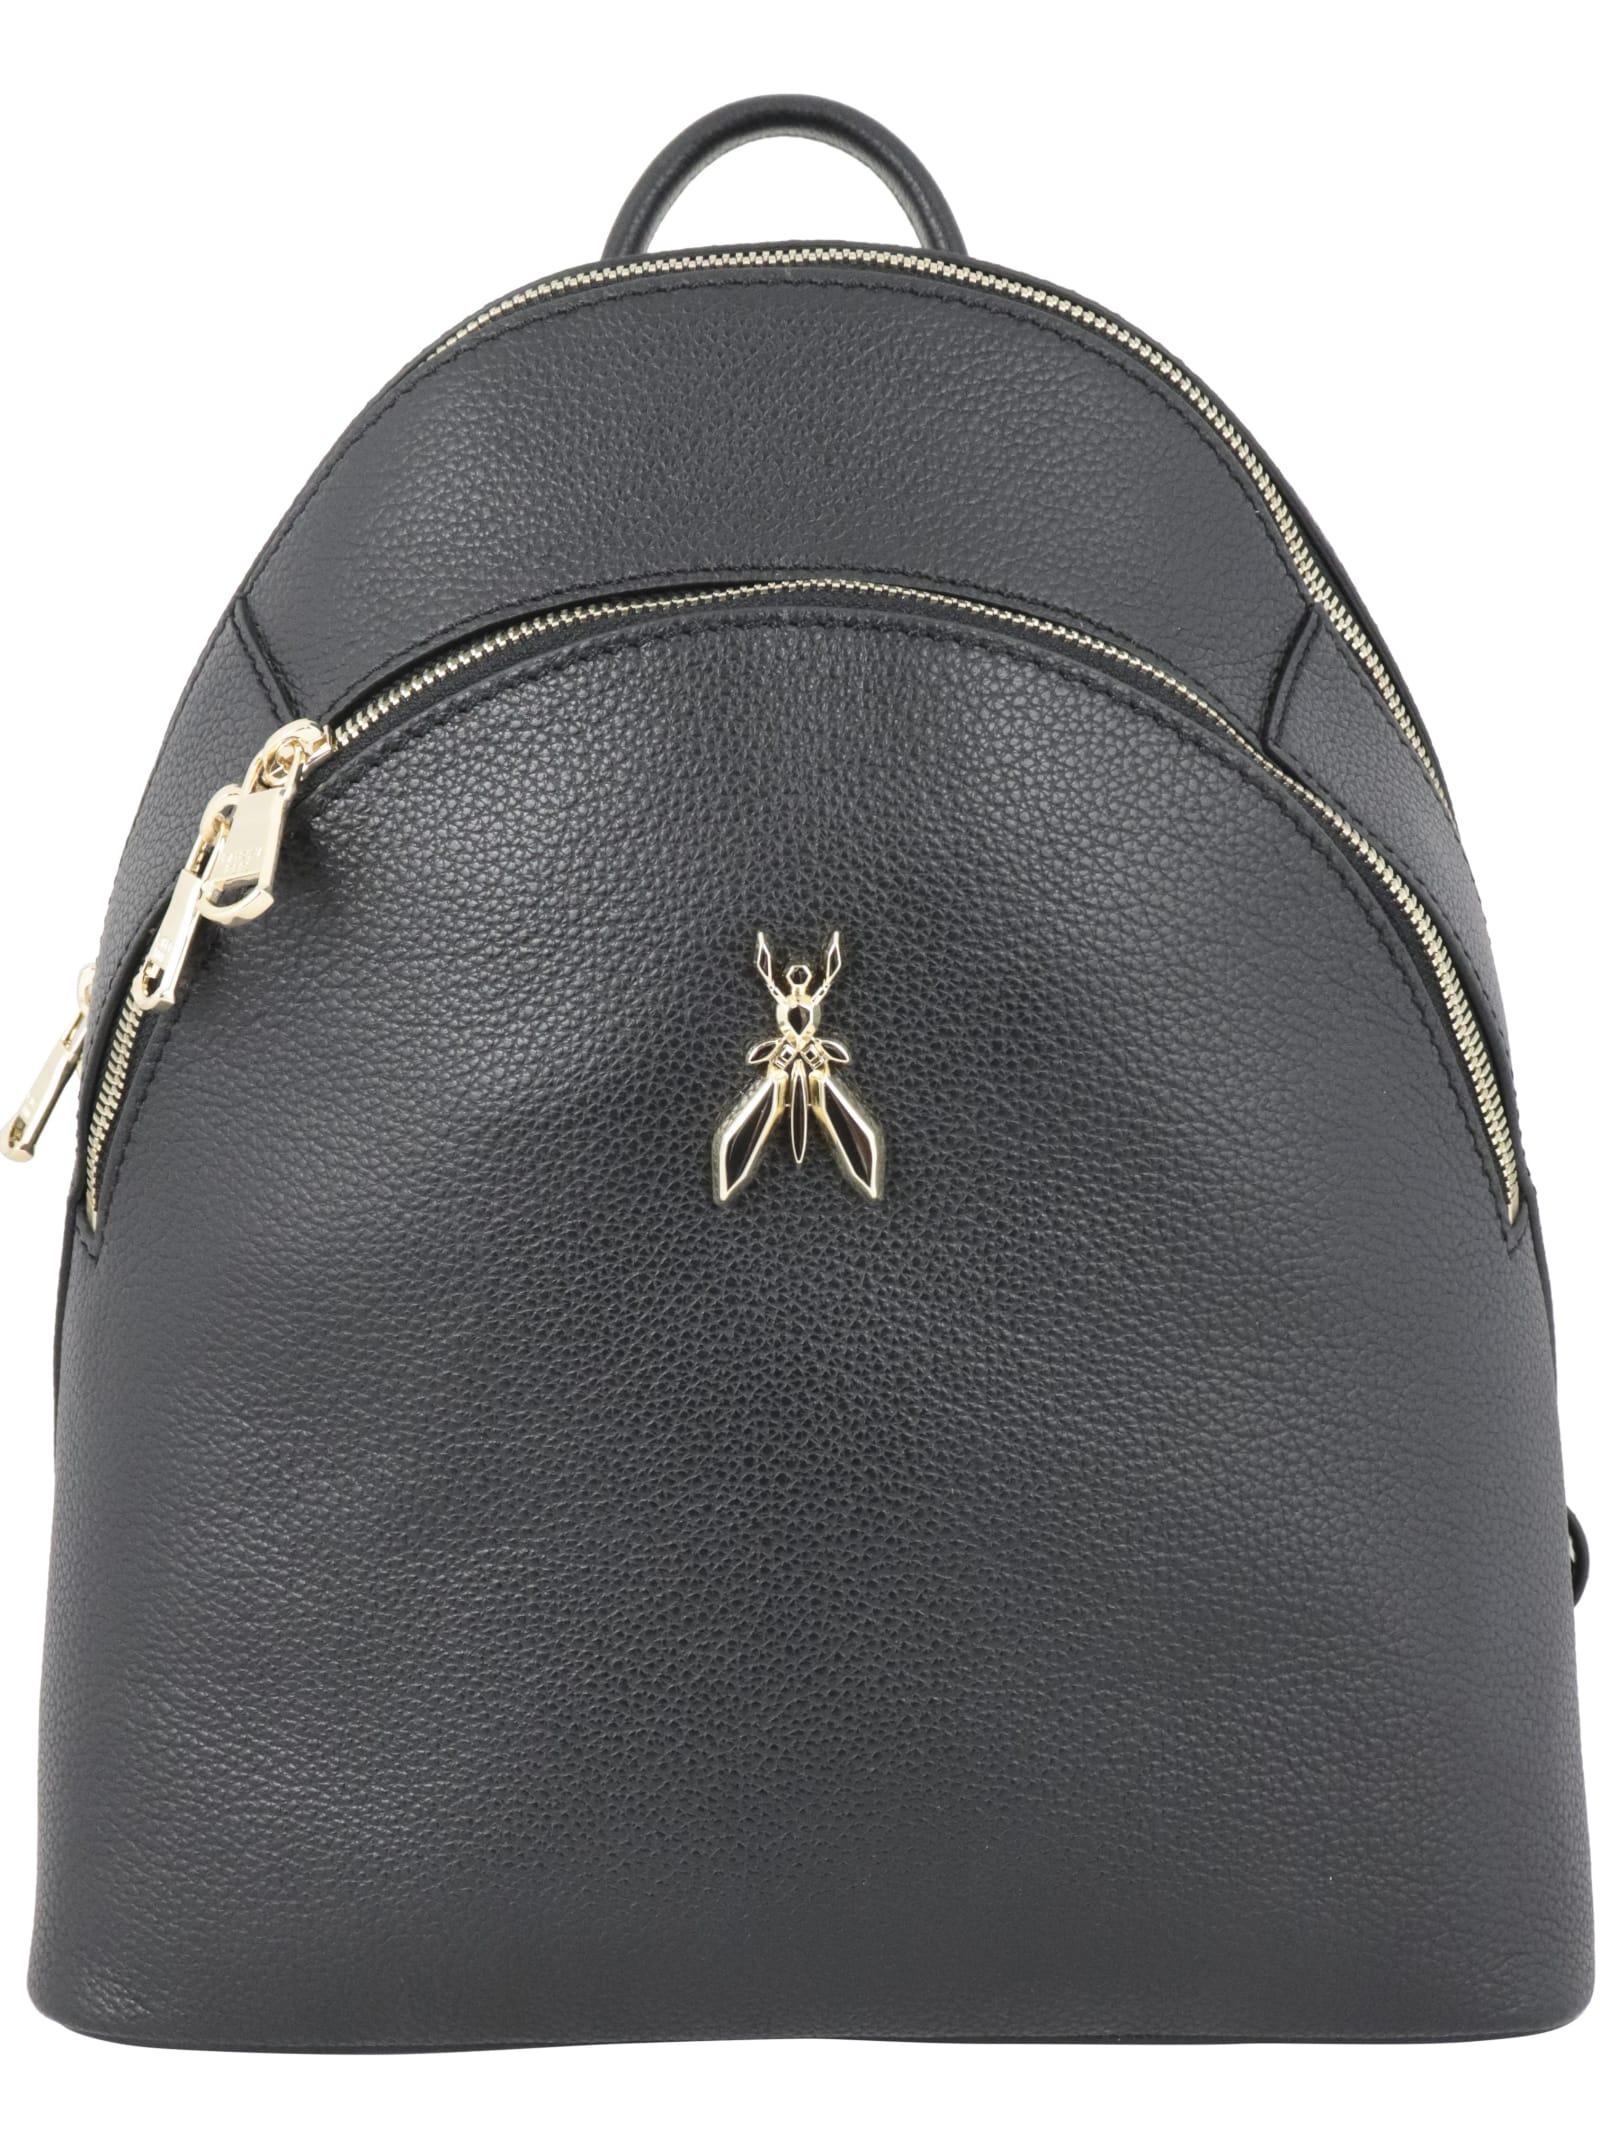 Patrizia Pepe Leather Backpack